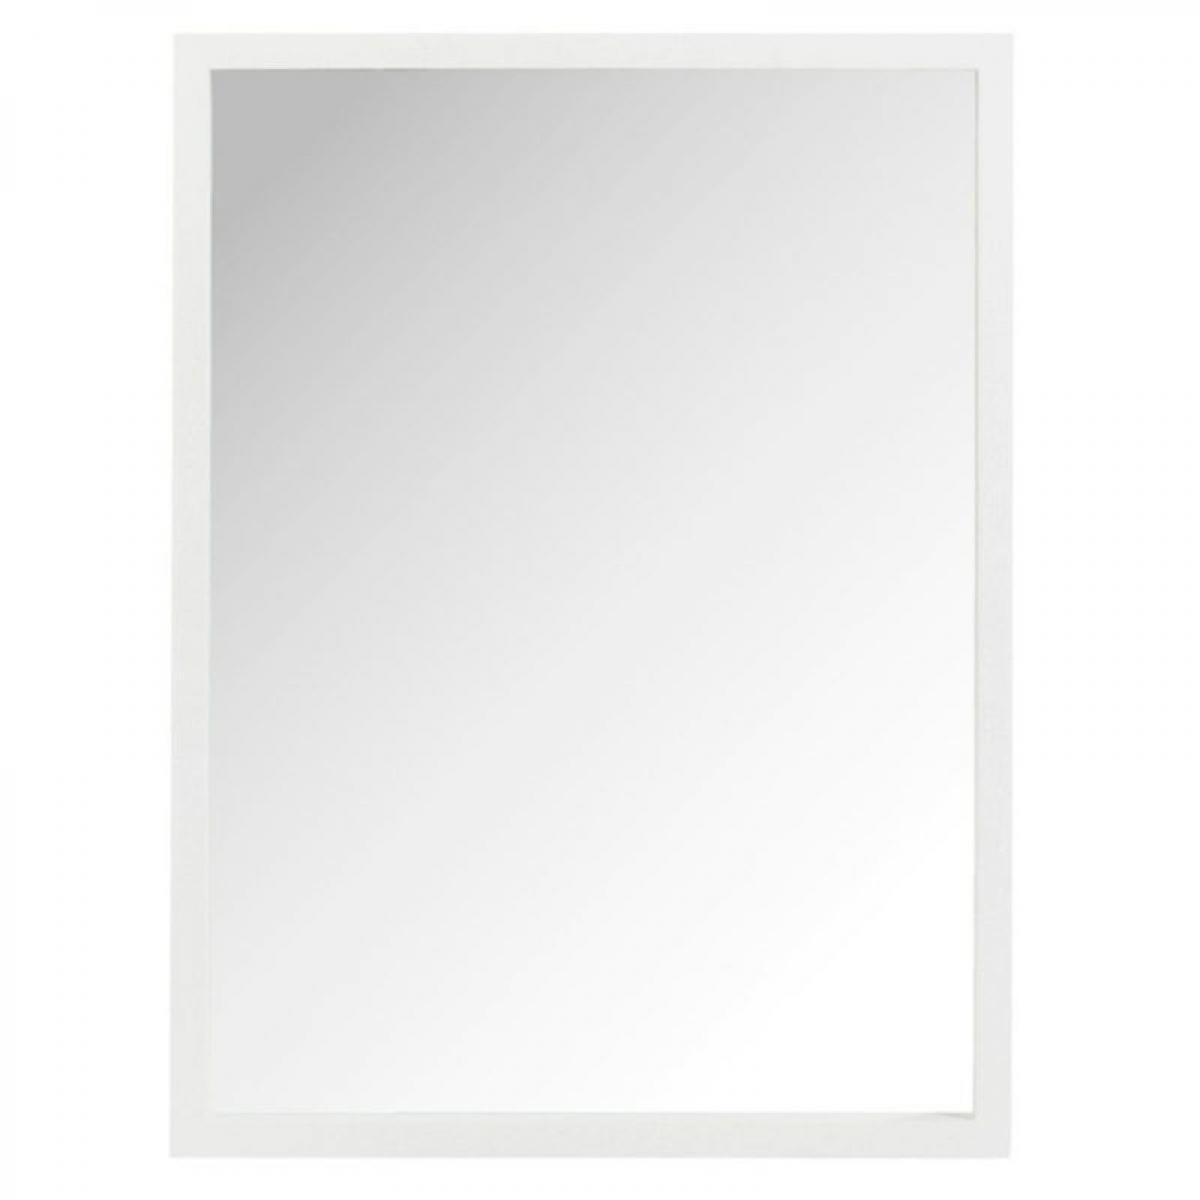 Paris Prix Miroir Mural Design Savin 80cm Blanc